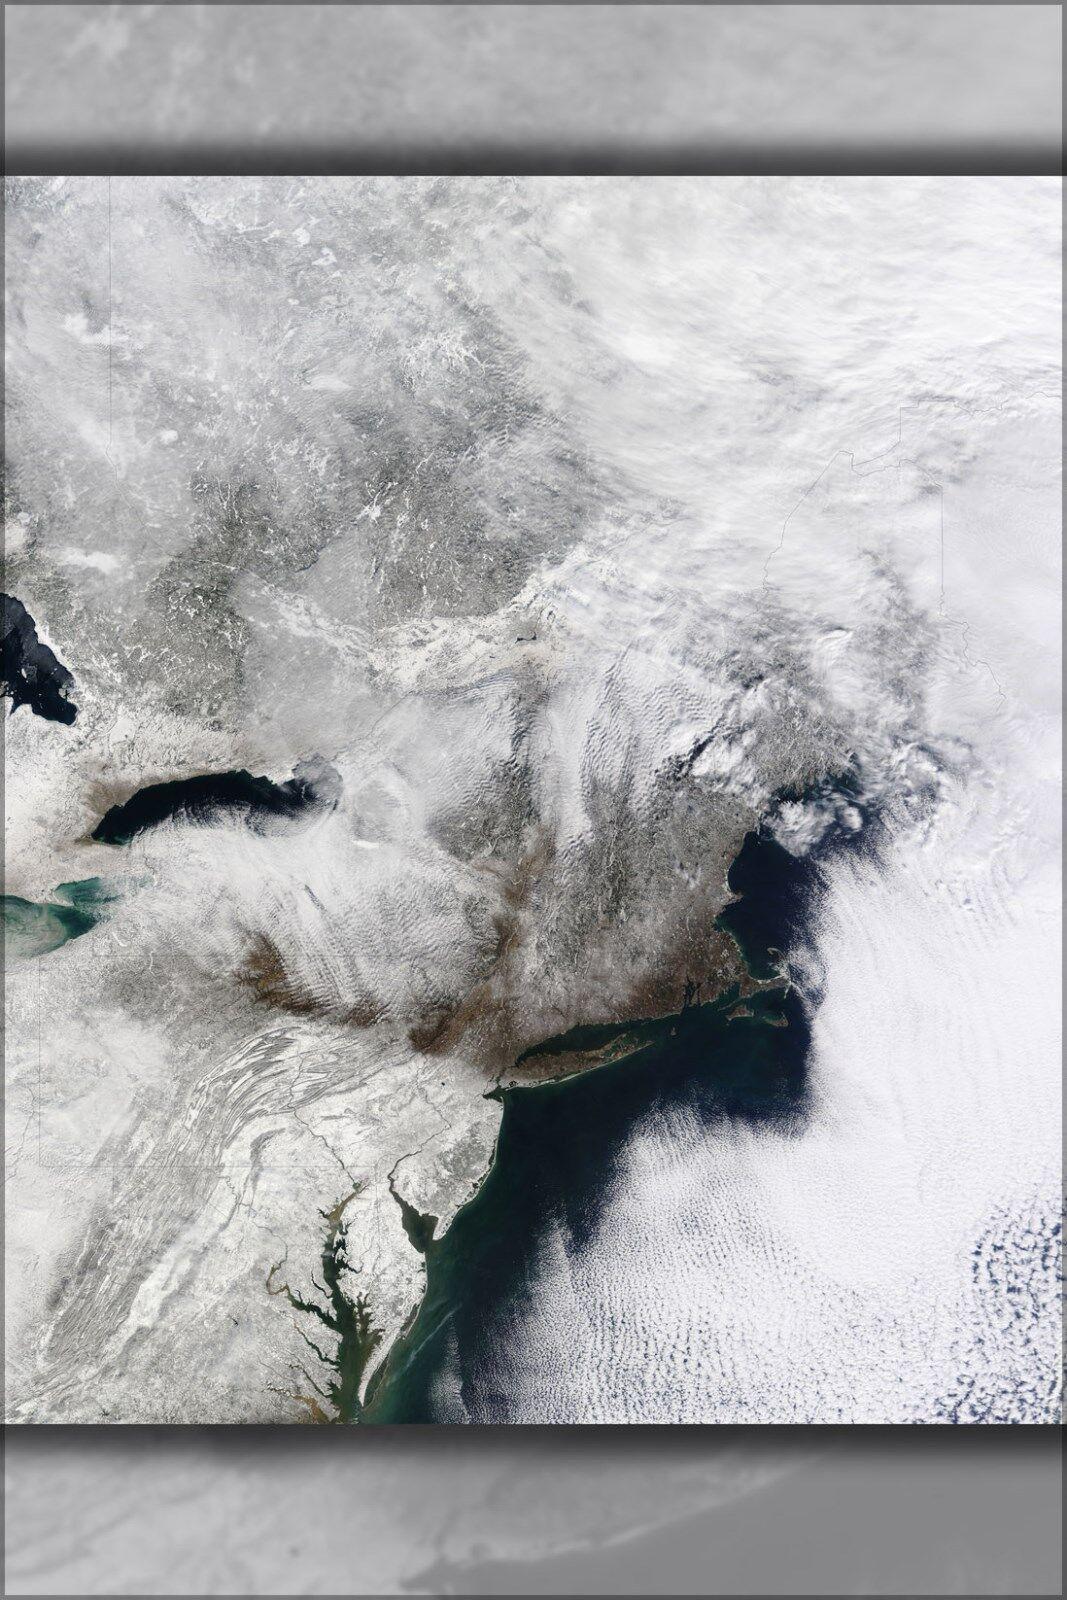 Plakat, Viele Größen; Neu-England Jersey Island Early Februar 2010 Blizzard